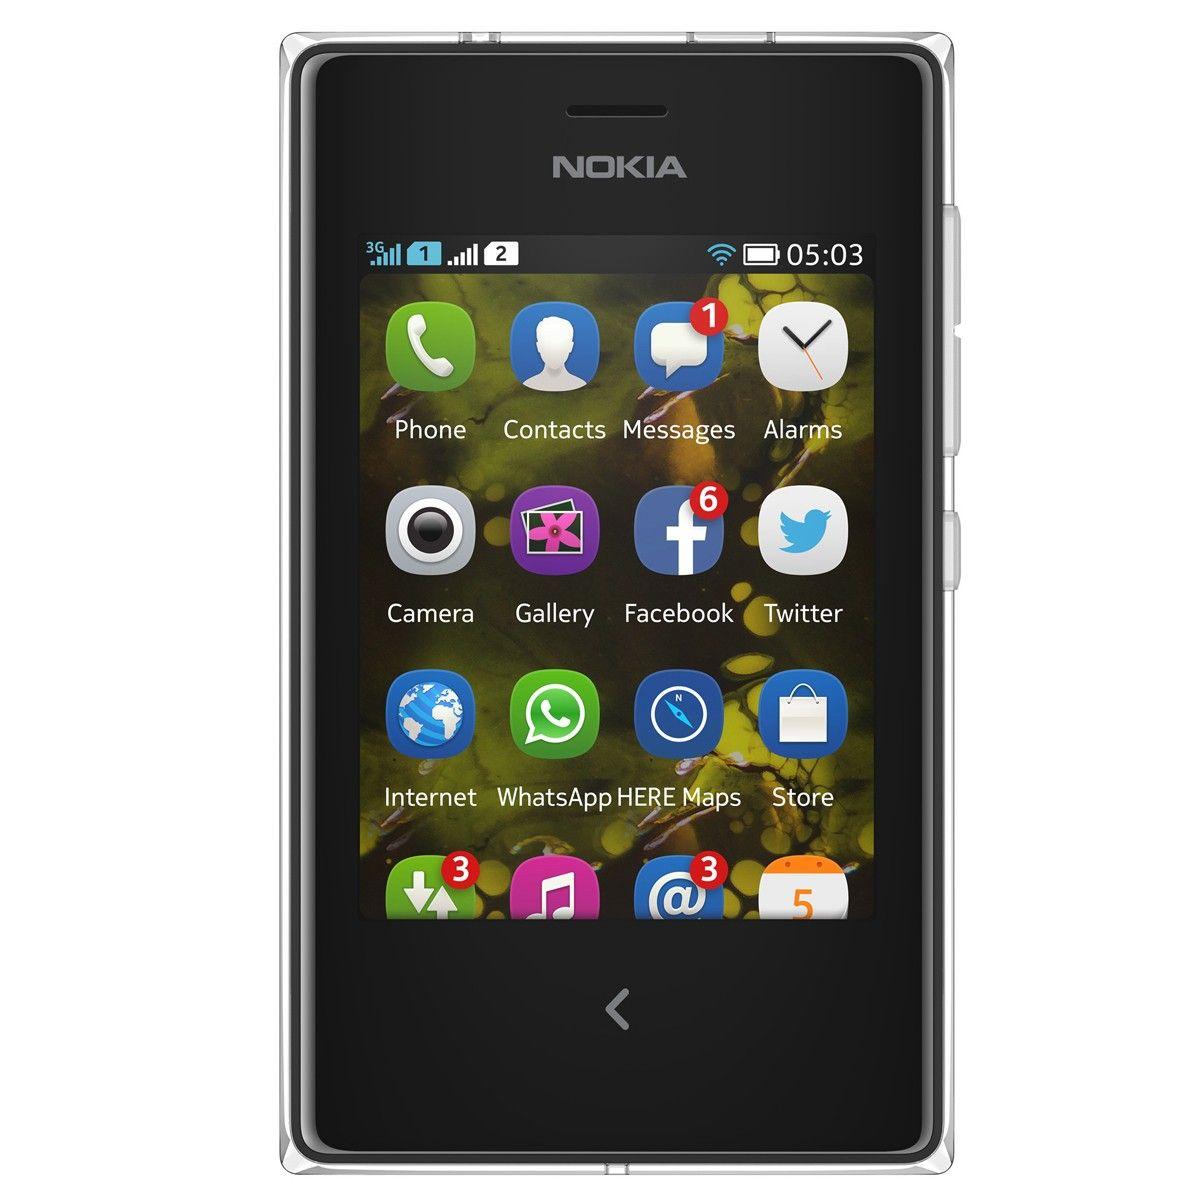 Nokia Asha 503 Single SIM